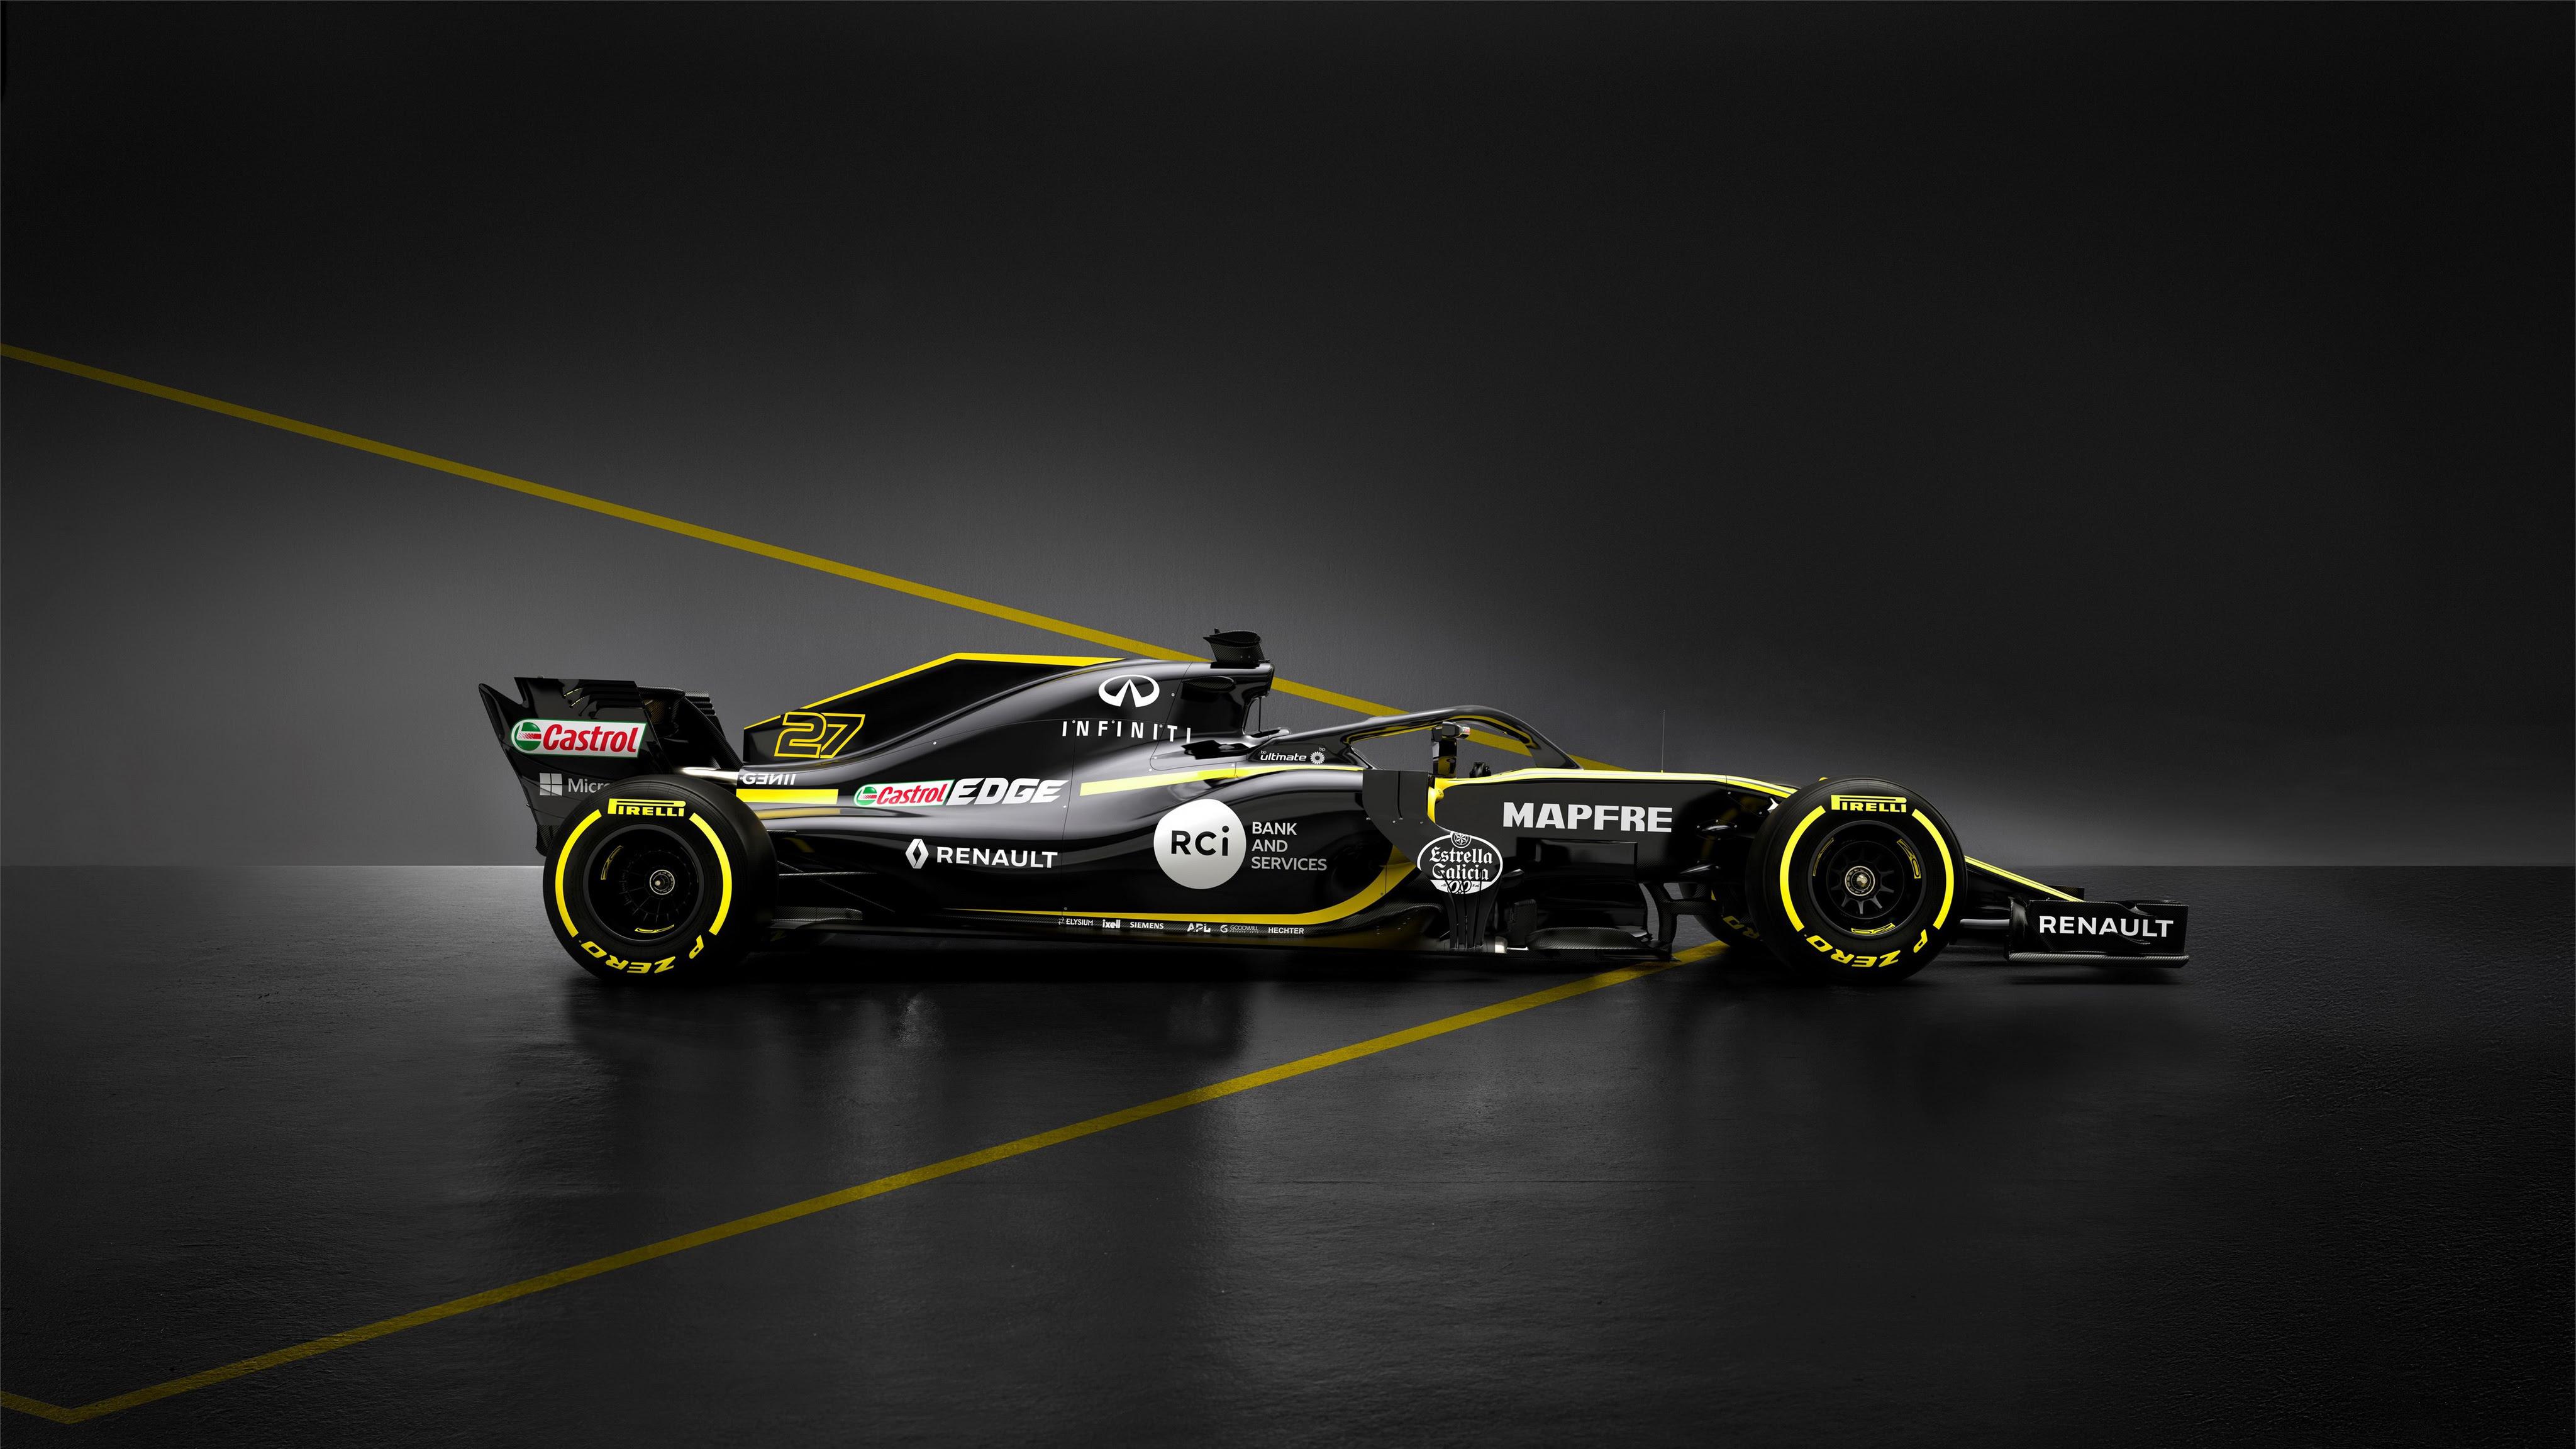 Formula 1 4k Wallpaper